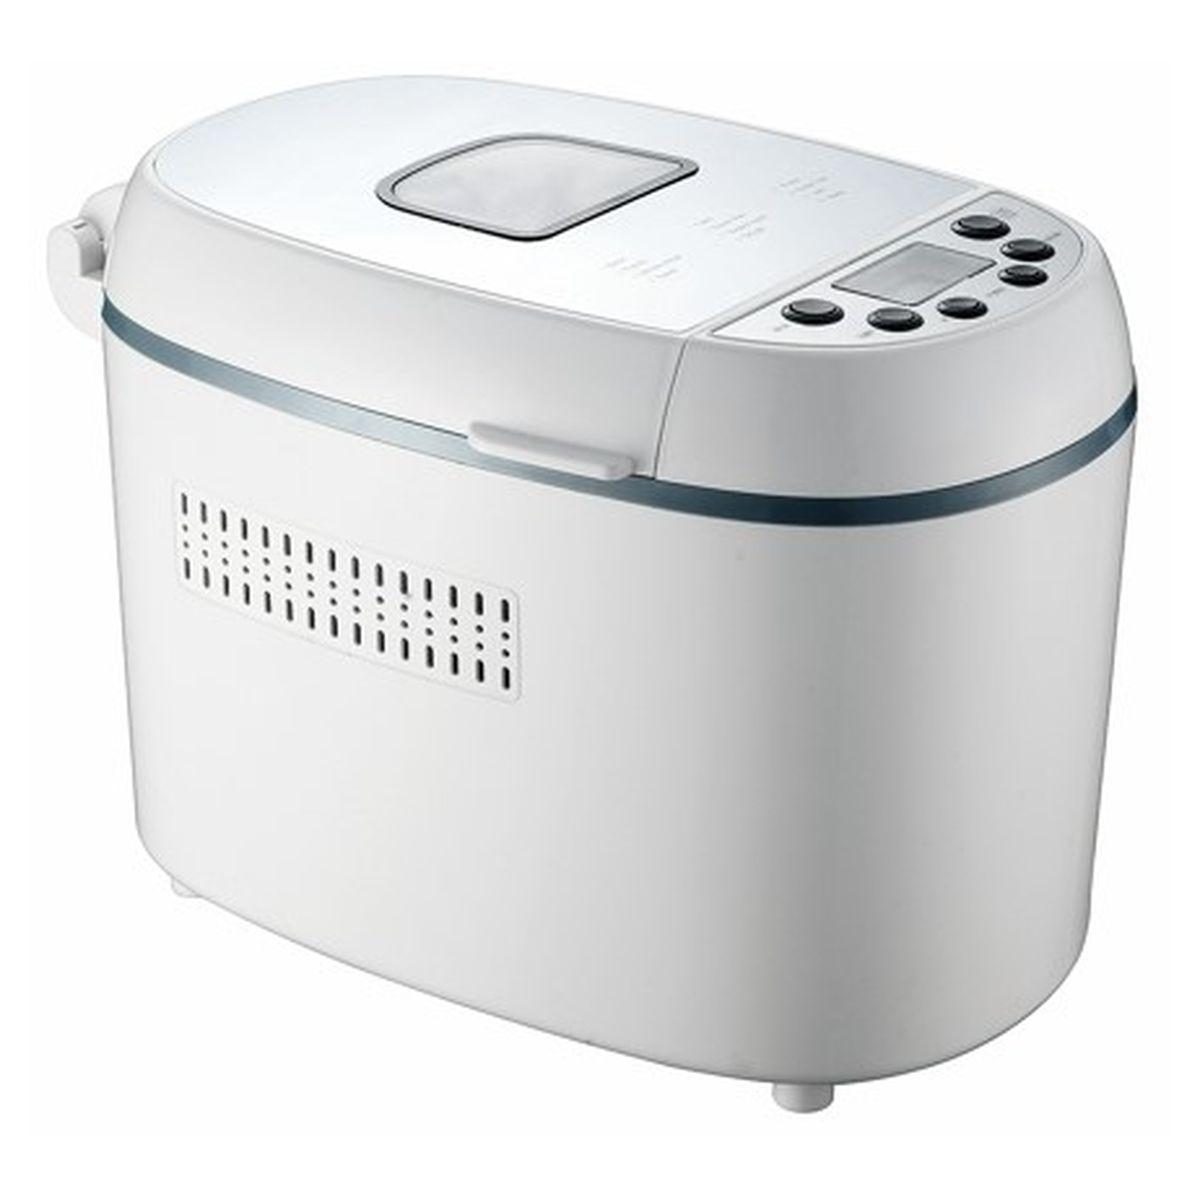 Machine à pain 002382 - Blanc